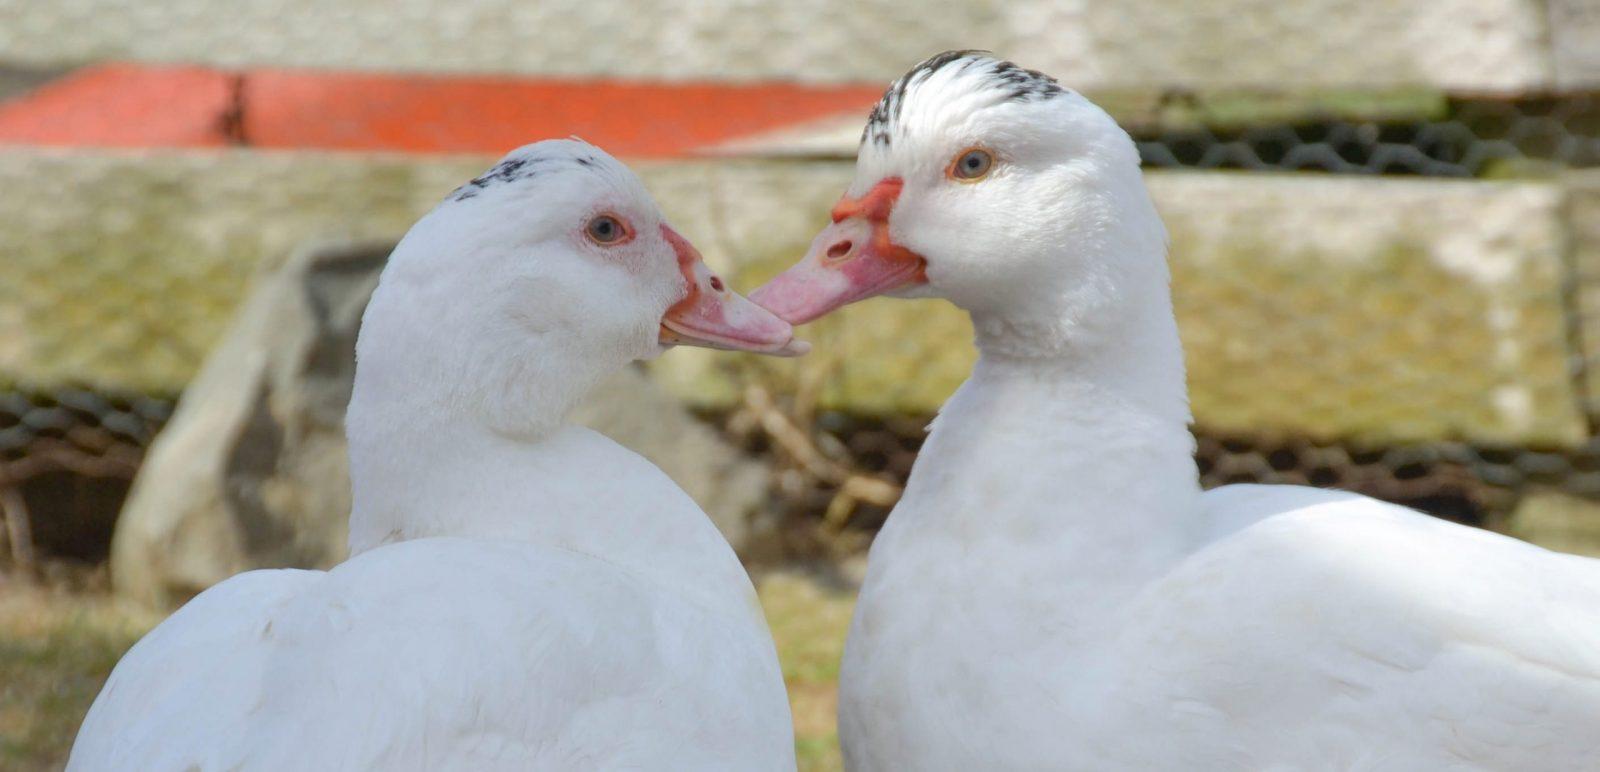 Alicia and Amelie ducks at Farm Sanctuary